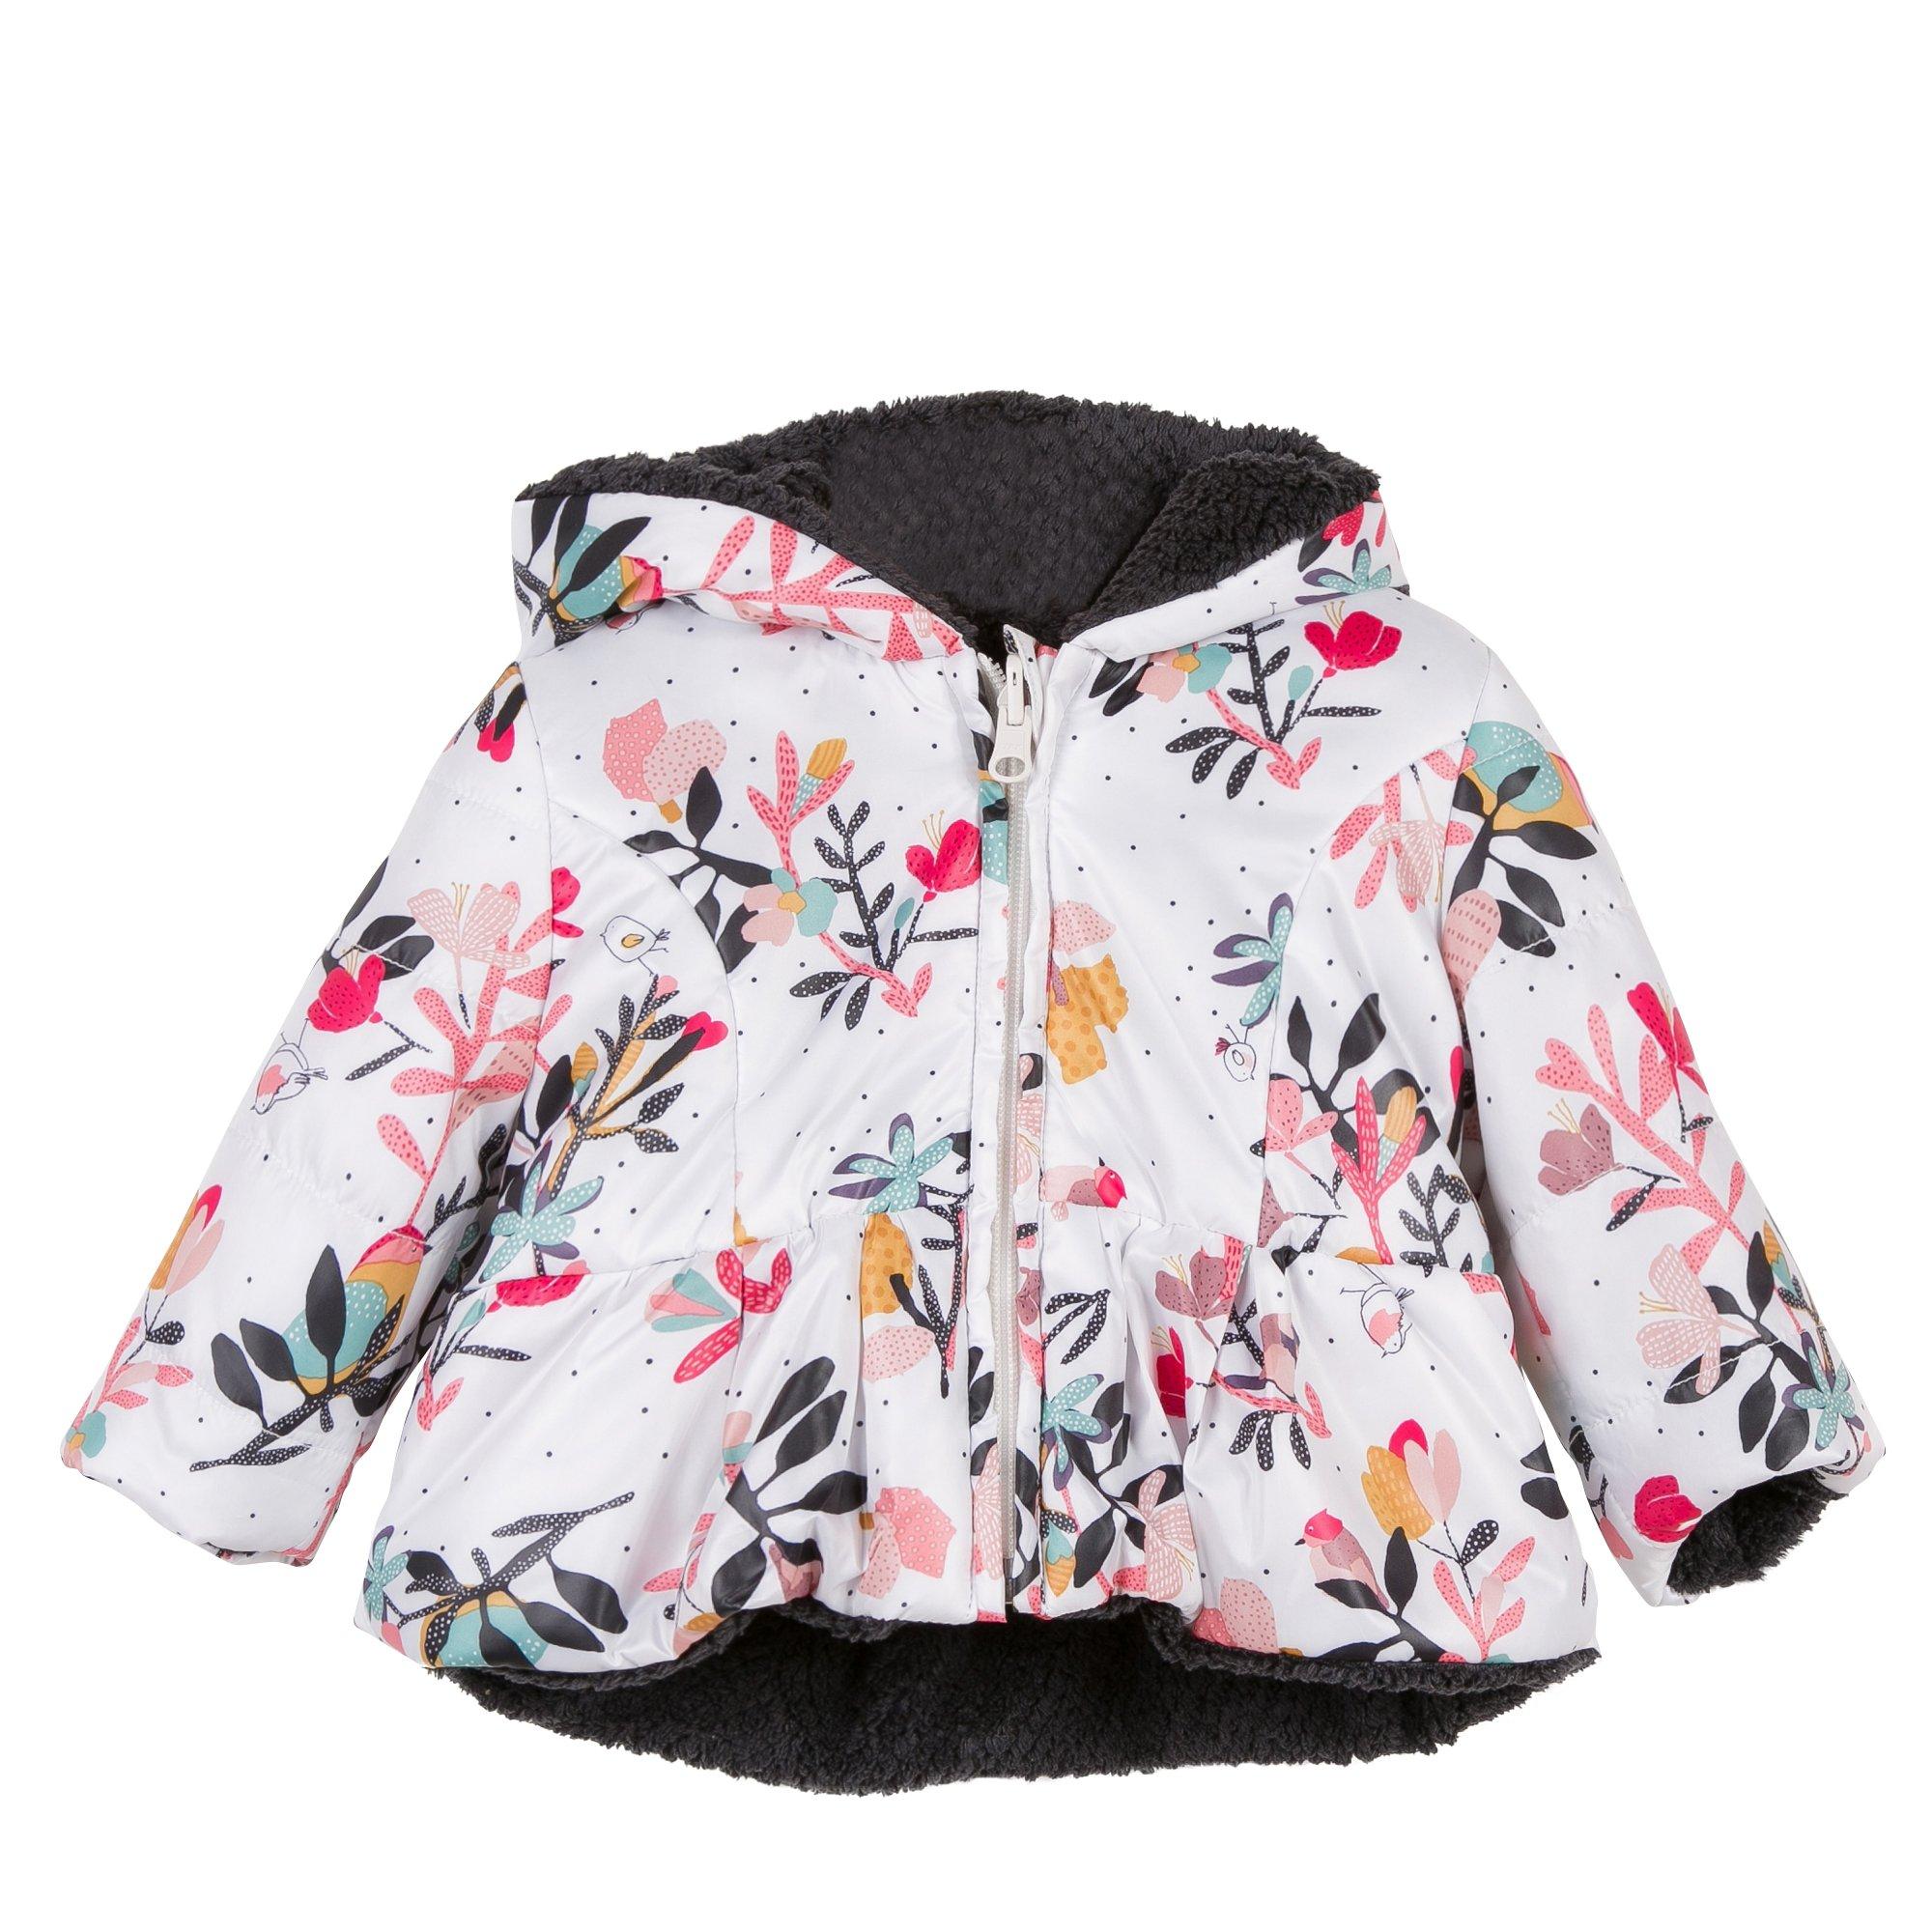 Catimini Floral & Charcoal Ma De Moi Zèle Reversible Jacket (2T) by Catimini